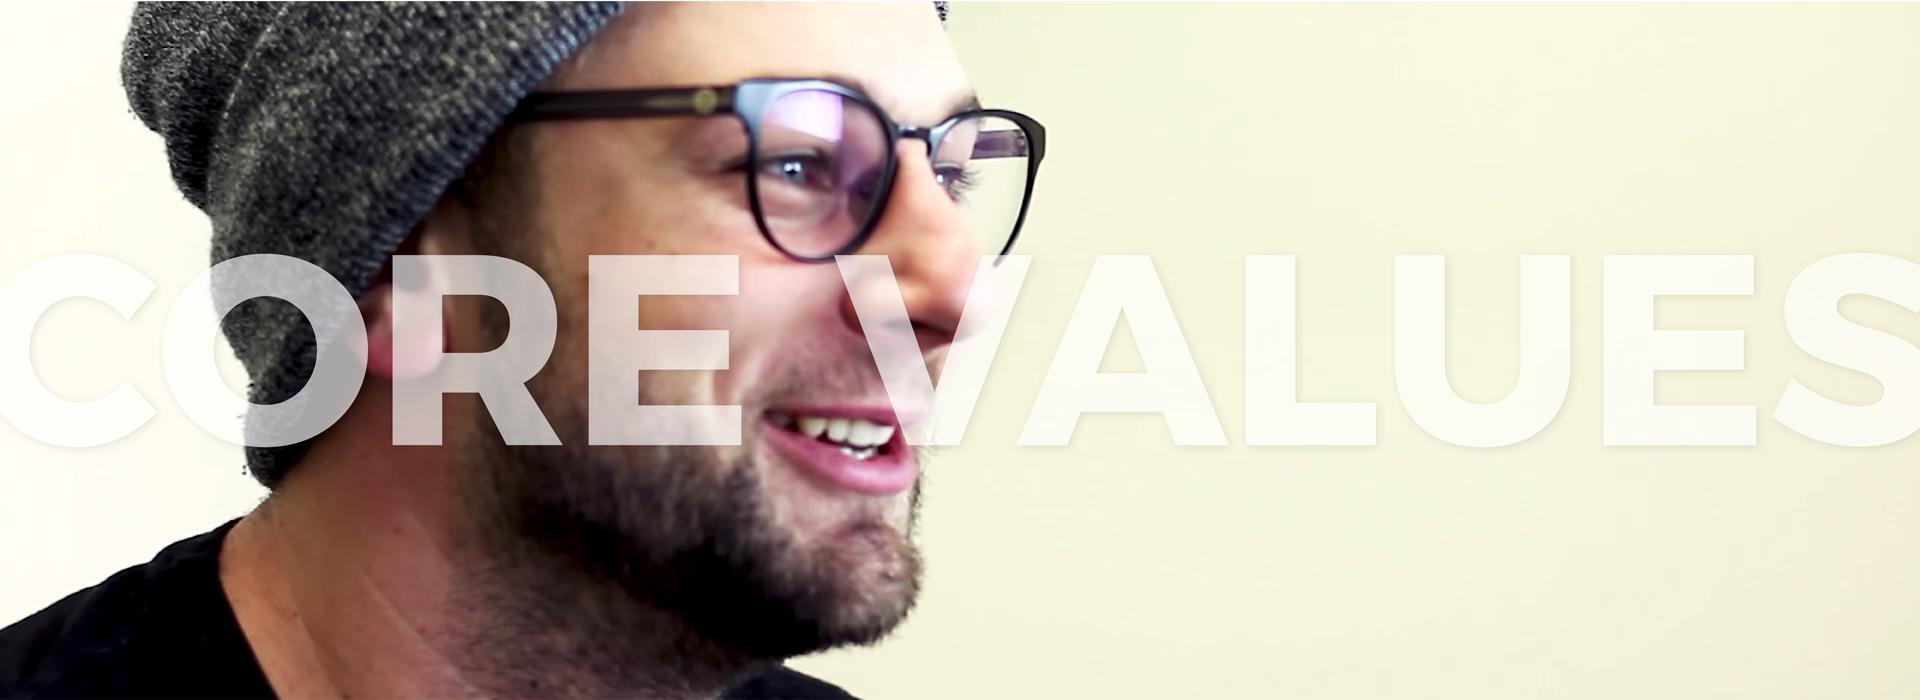 Core Values Video